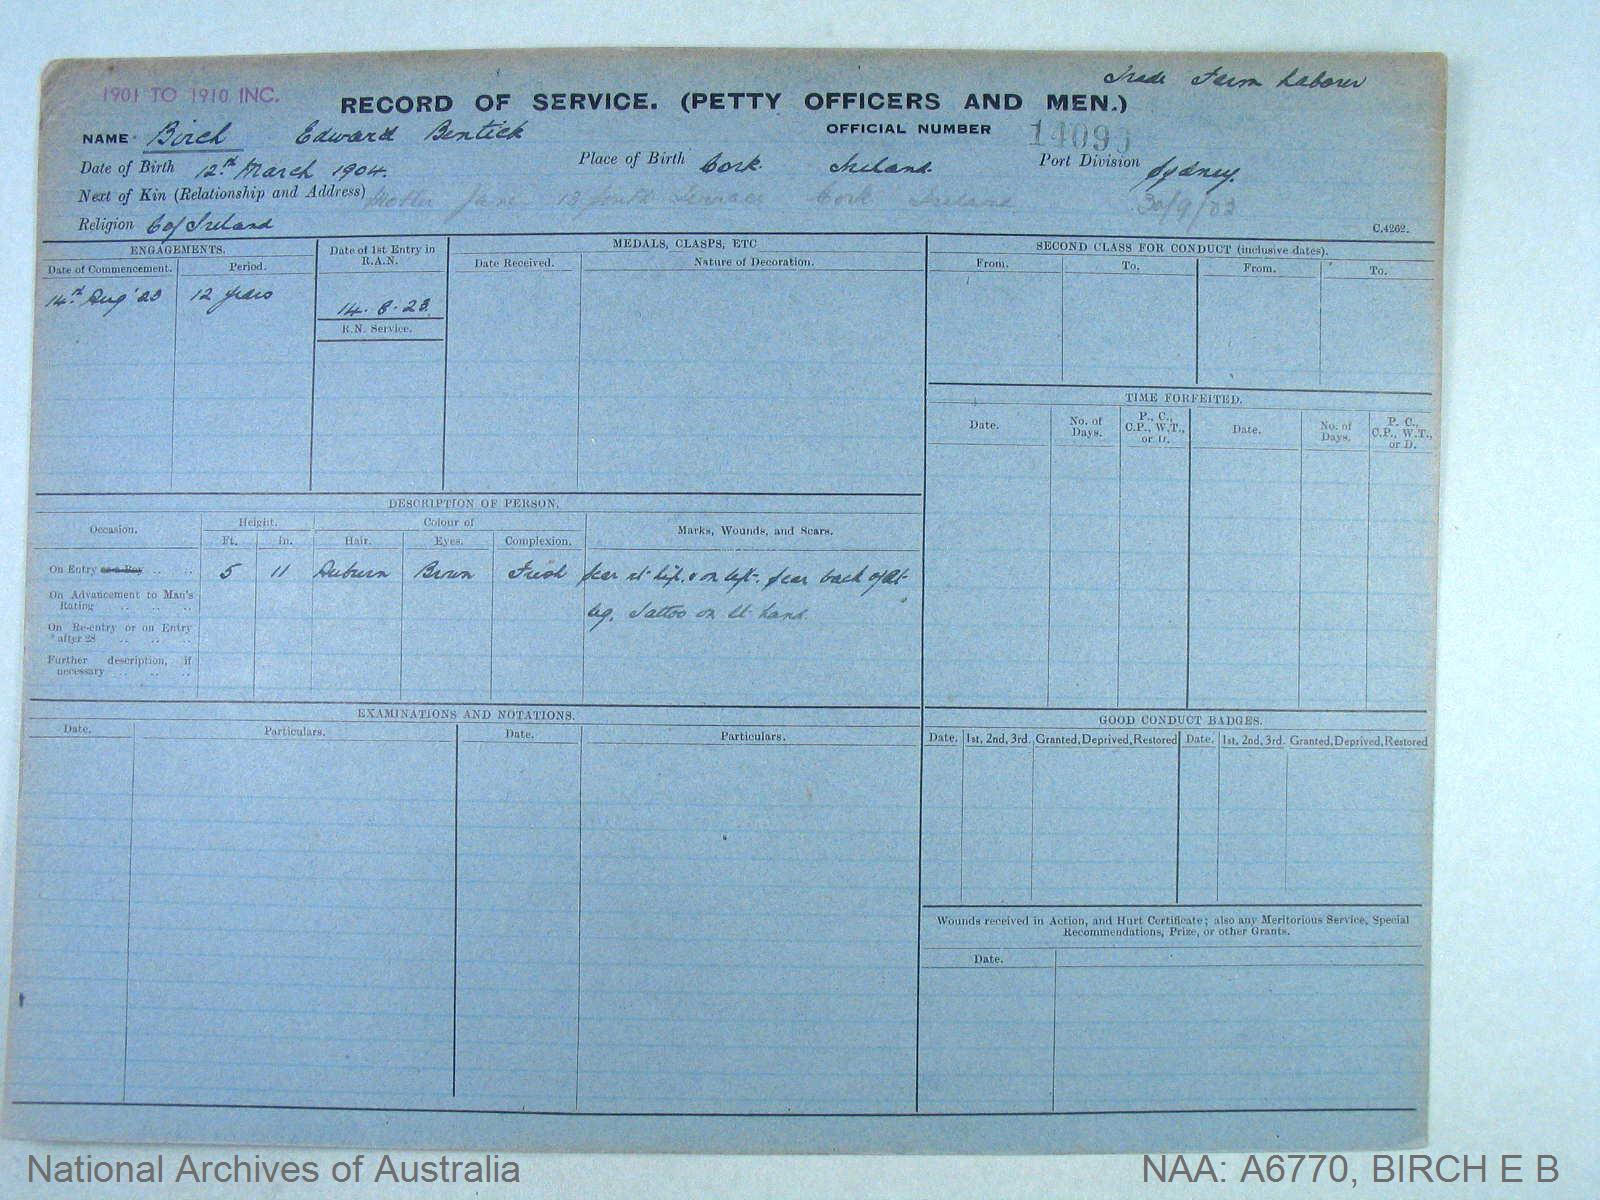 BIRCH EDWARD BERTICK : Service Number - 14090 : Date of birth - 12 Mar 1904 : Place of birth - CORK IRELAND : Place of enlistment - SYDNEY : Next of Kin - BIRCH JANE